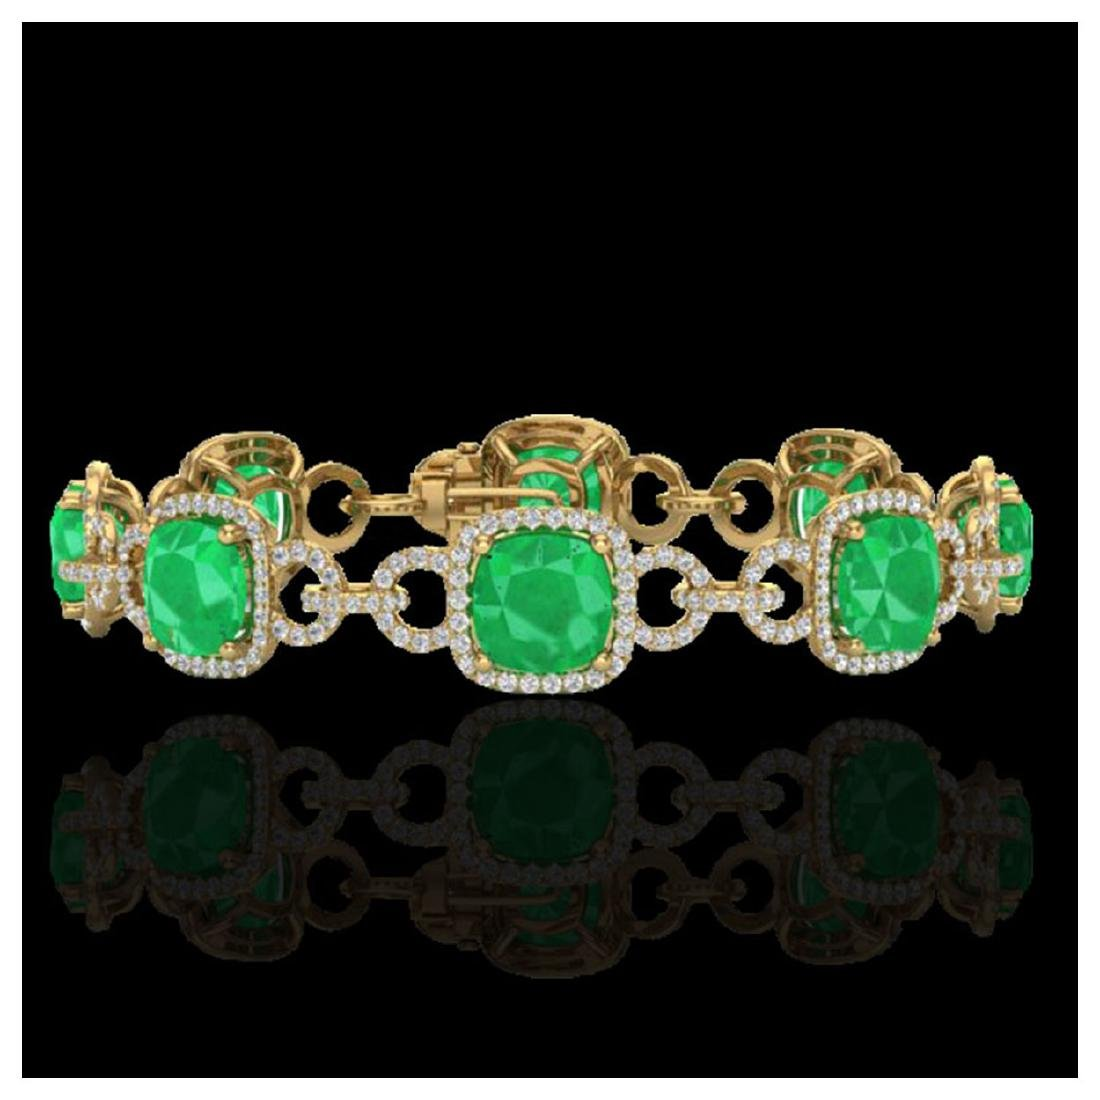 25 ctw Emerald & VS/SI Diamond Bracelet 14K Yellow Gold